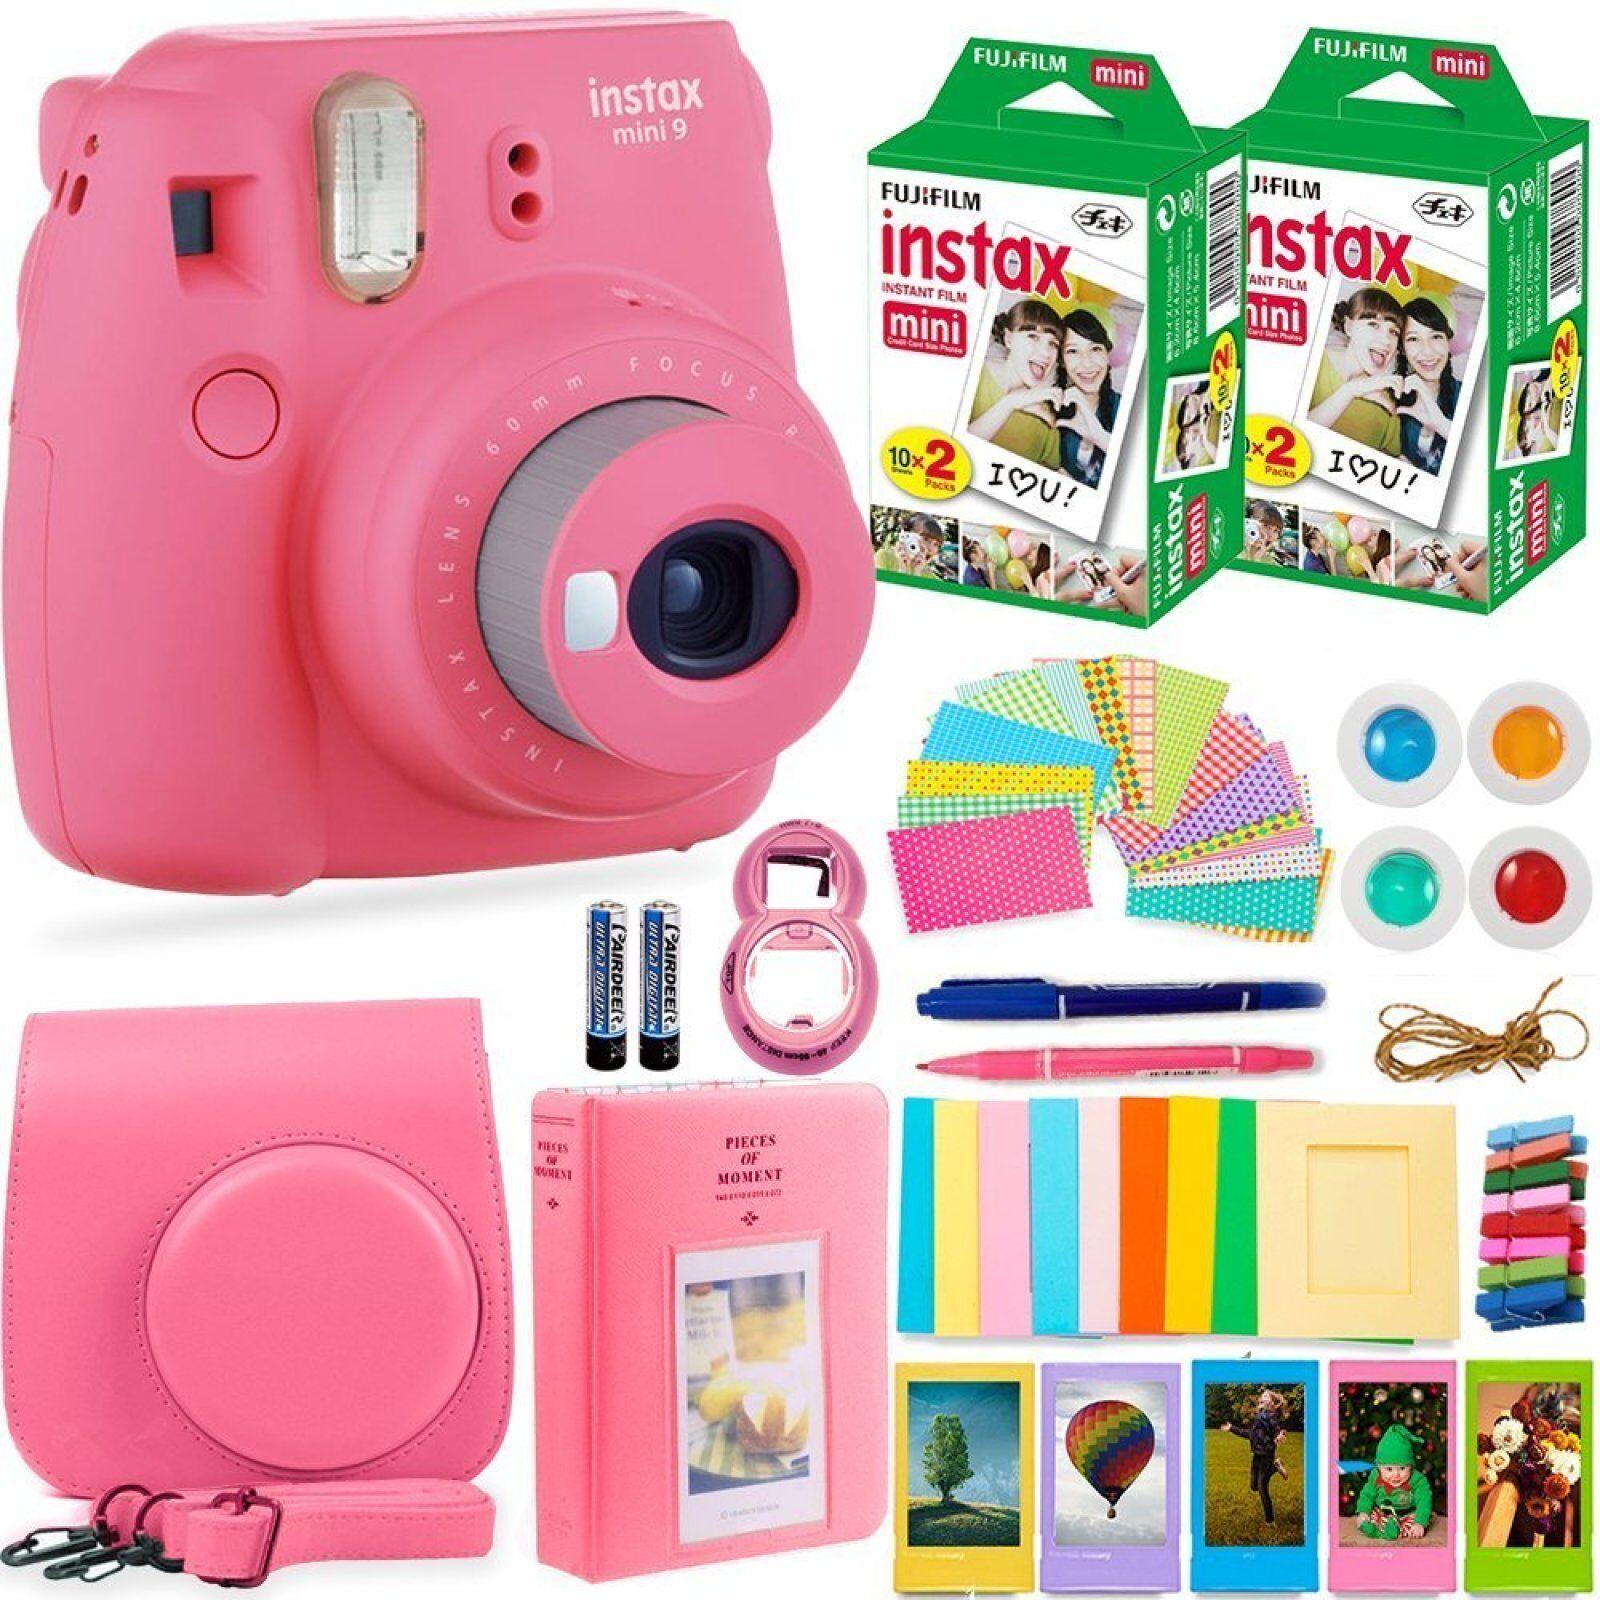 DEALS NUMBER ONE Fujifilm Instax Mini 9 Camera with Fuji Ins